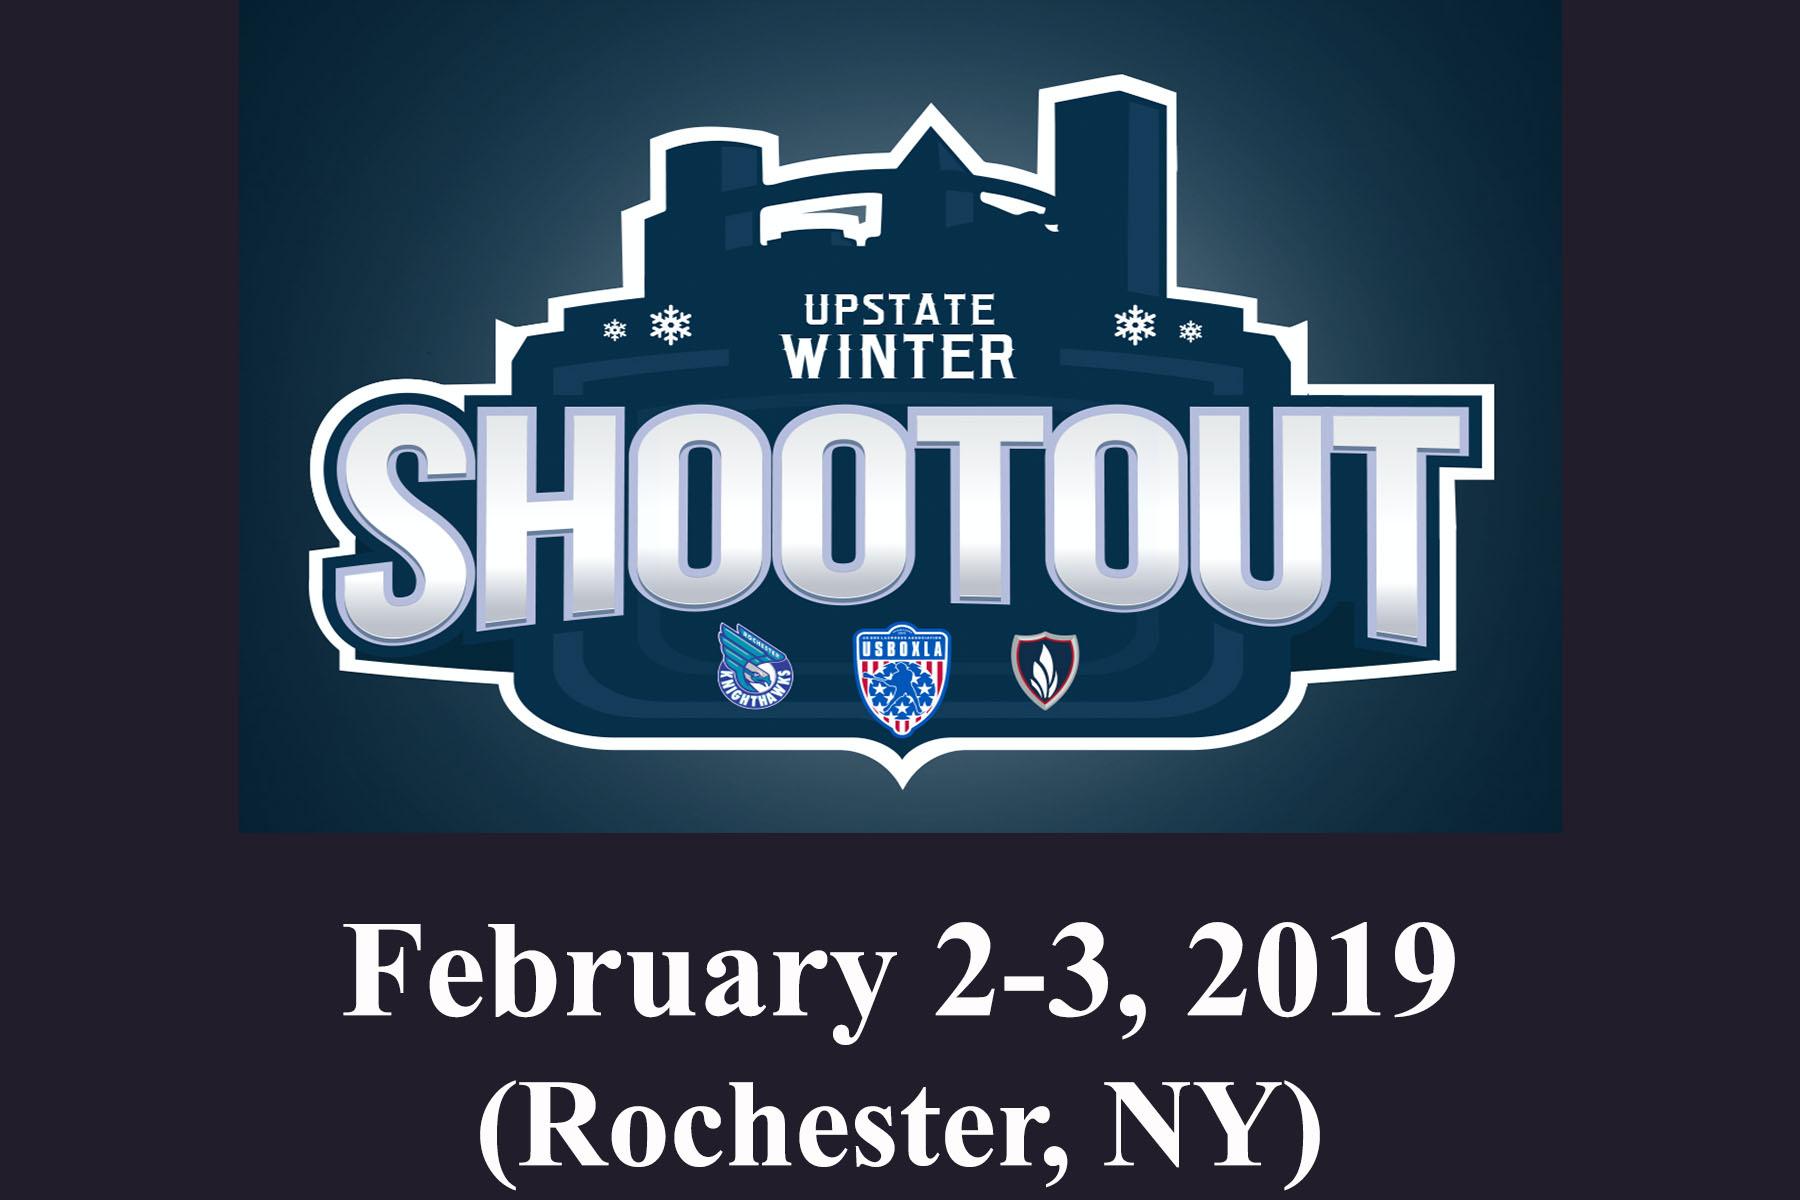 Upstate Winter Shootout